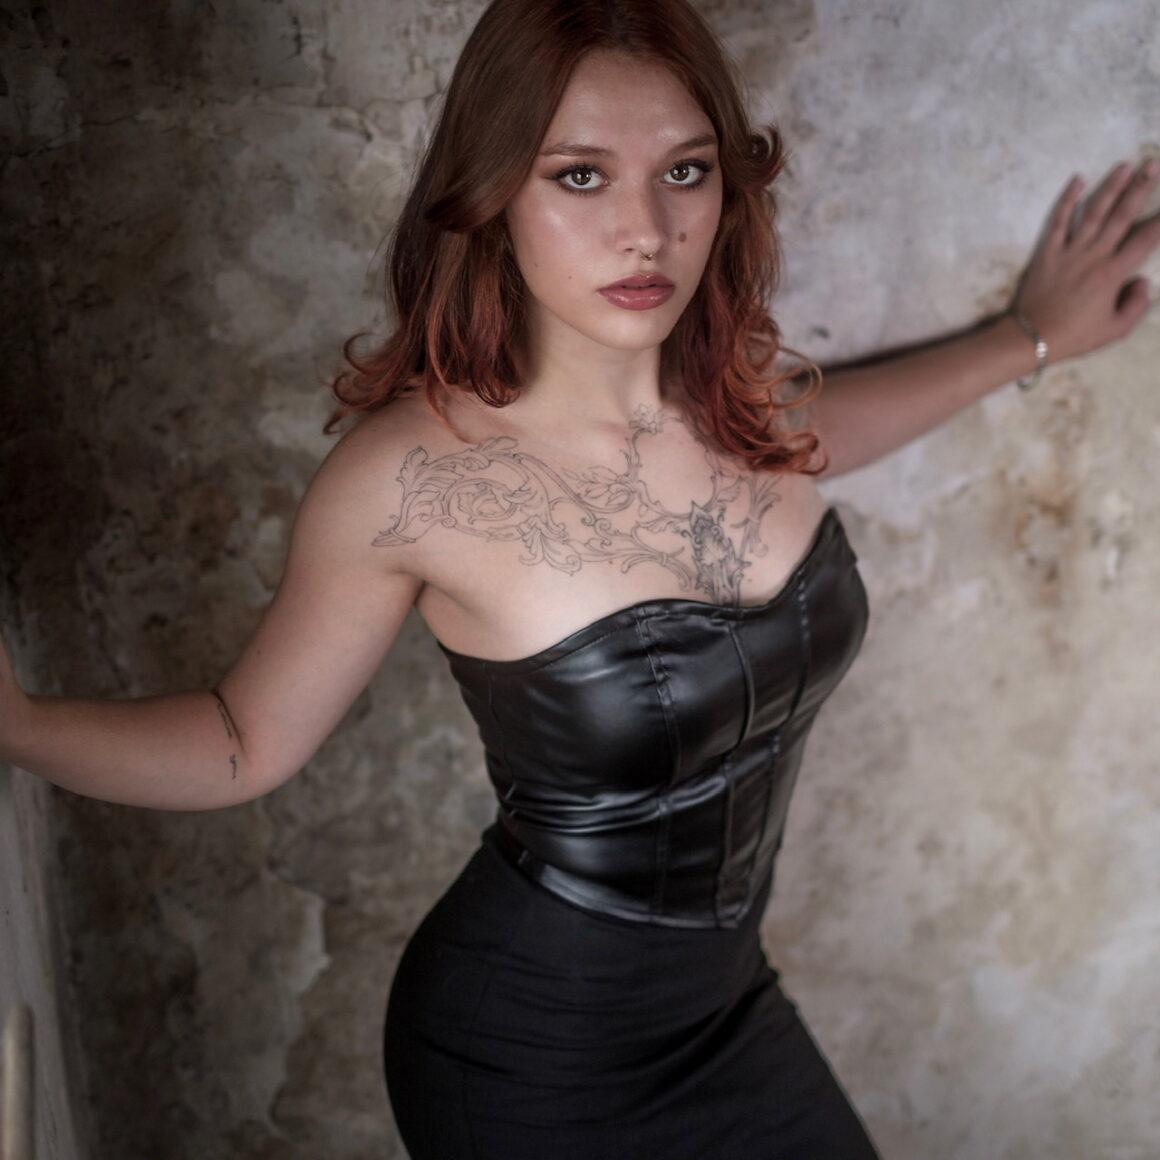 Kim Viergever, tattoo model, photo by @marc_glaudemans